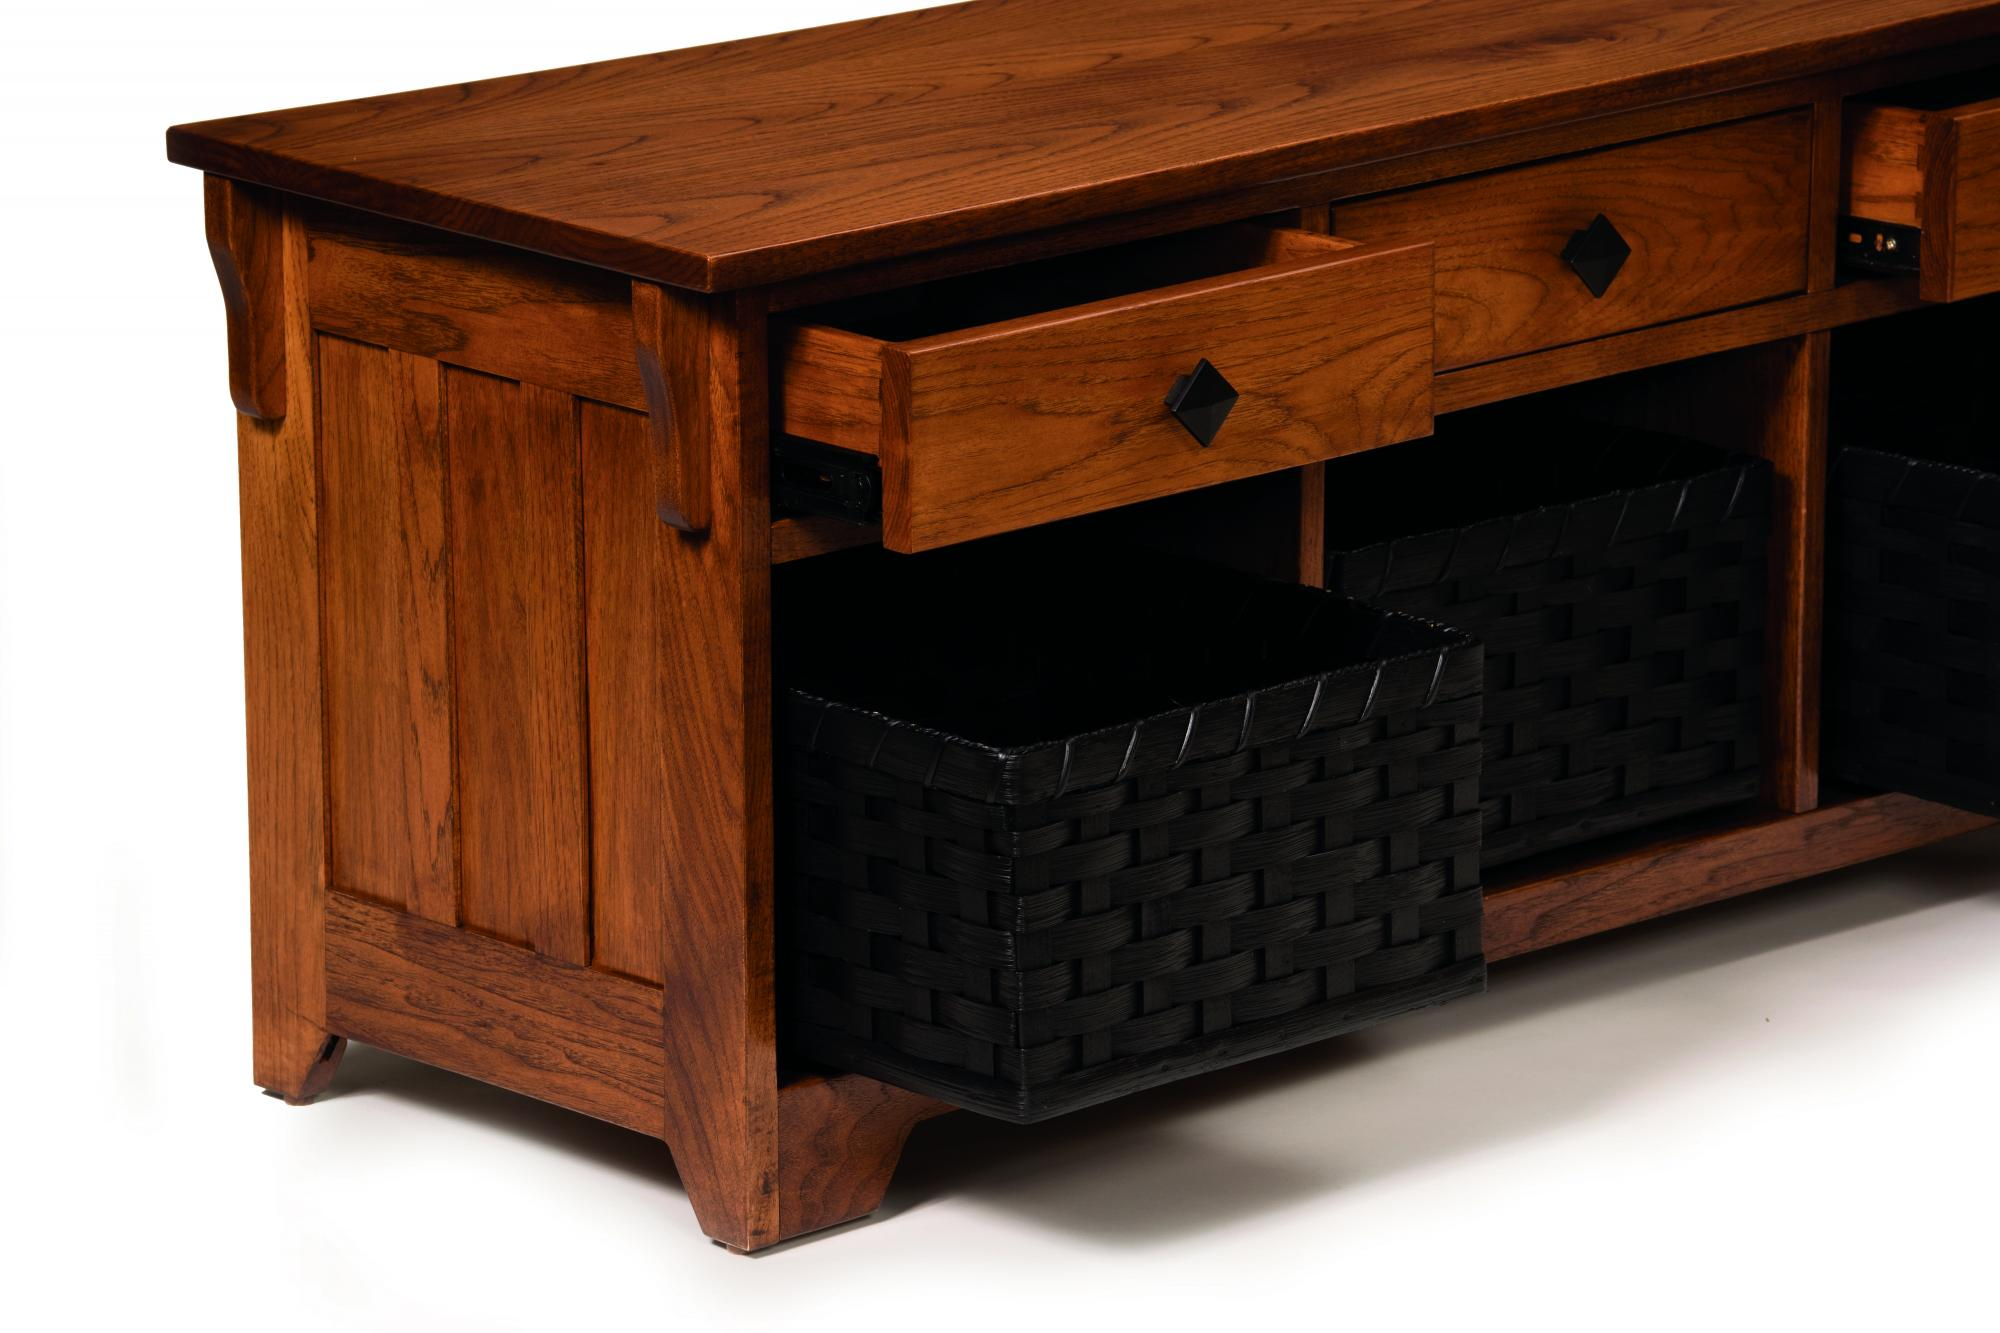 Lattice Weave Drawer Amish Furniture Store Mankato Mn